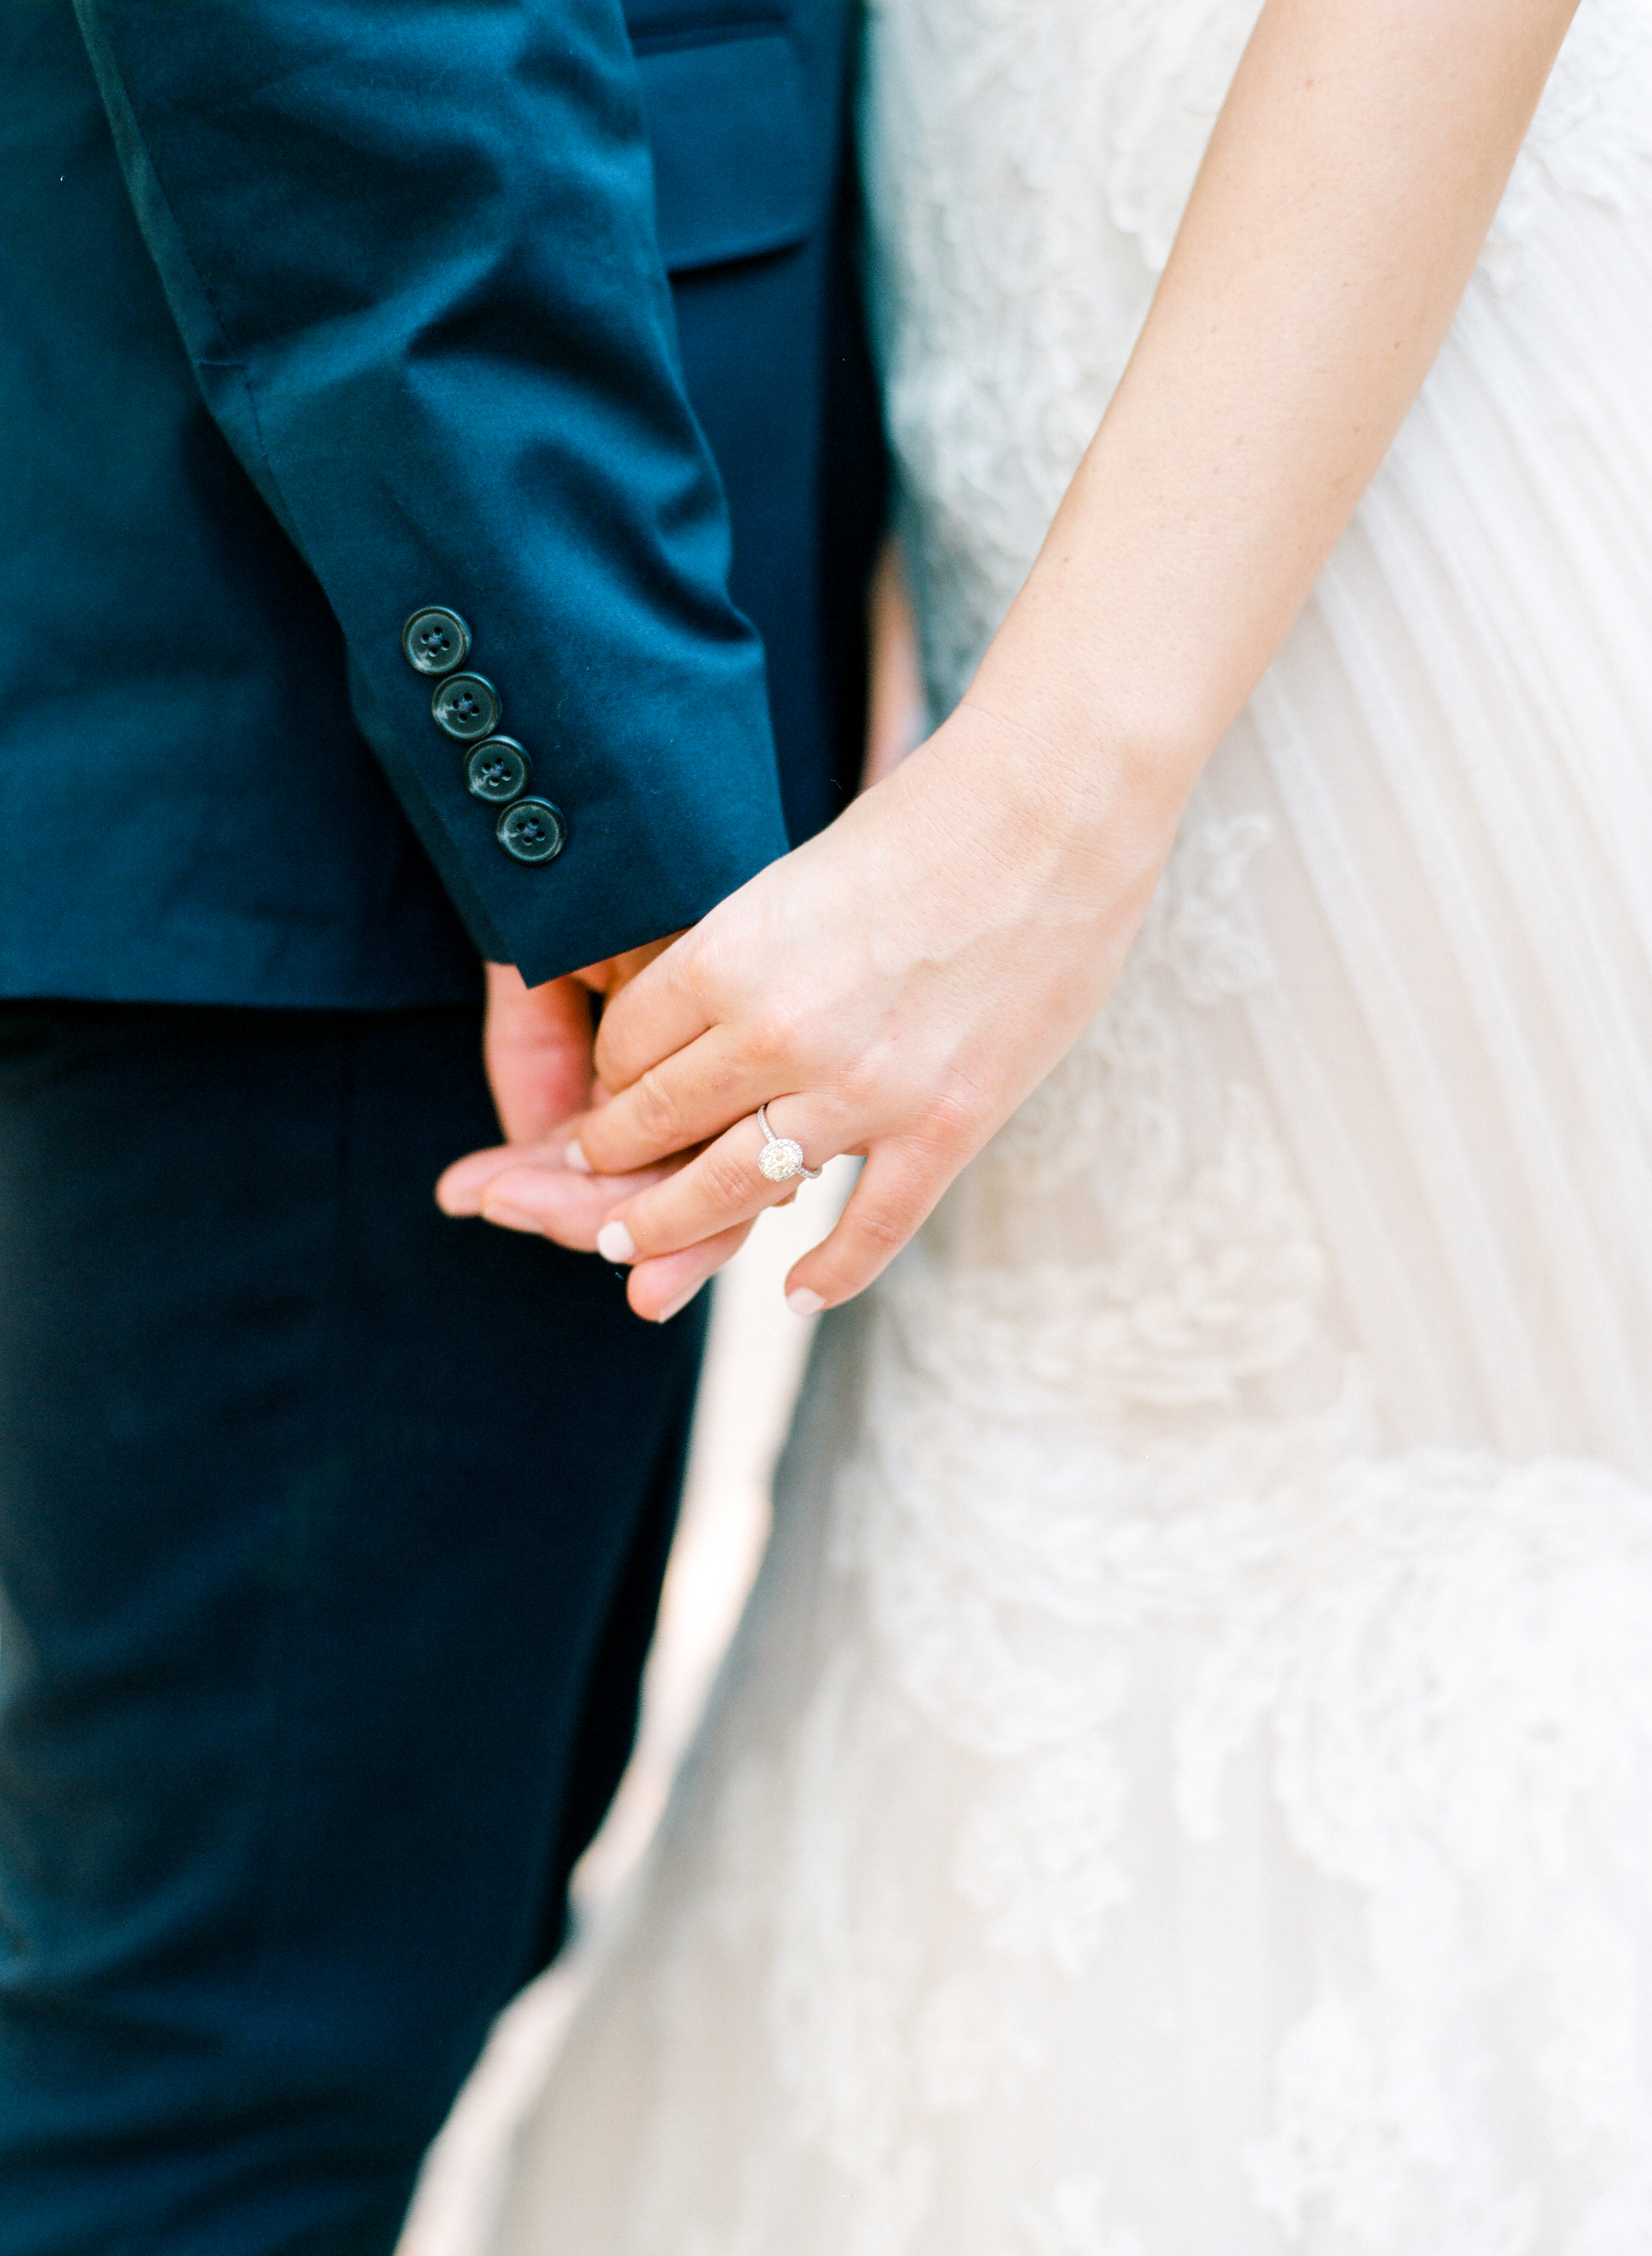 dana-fernandez-photography-the-wedding-chicks-film-houston-wedding-photography-destination-17.jpg